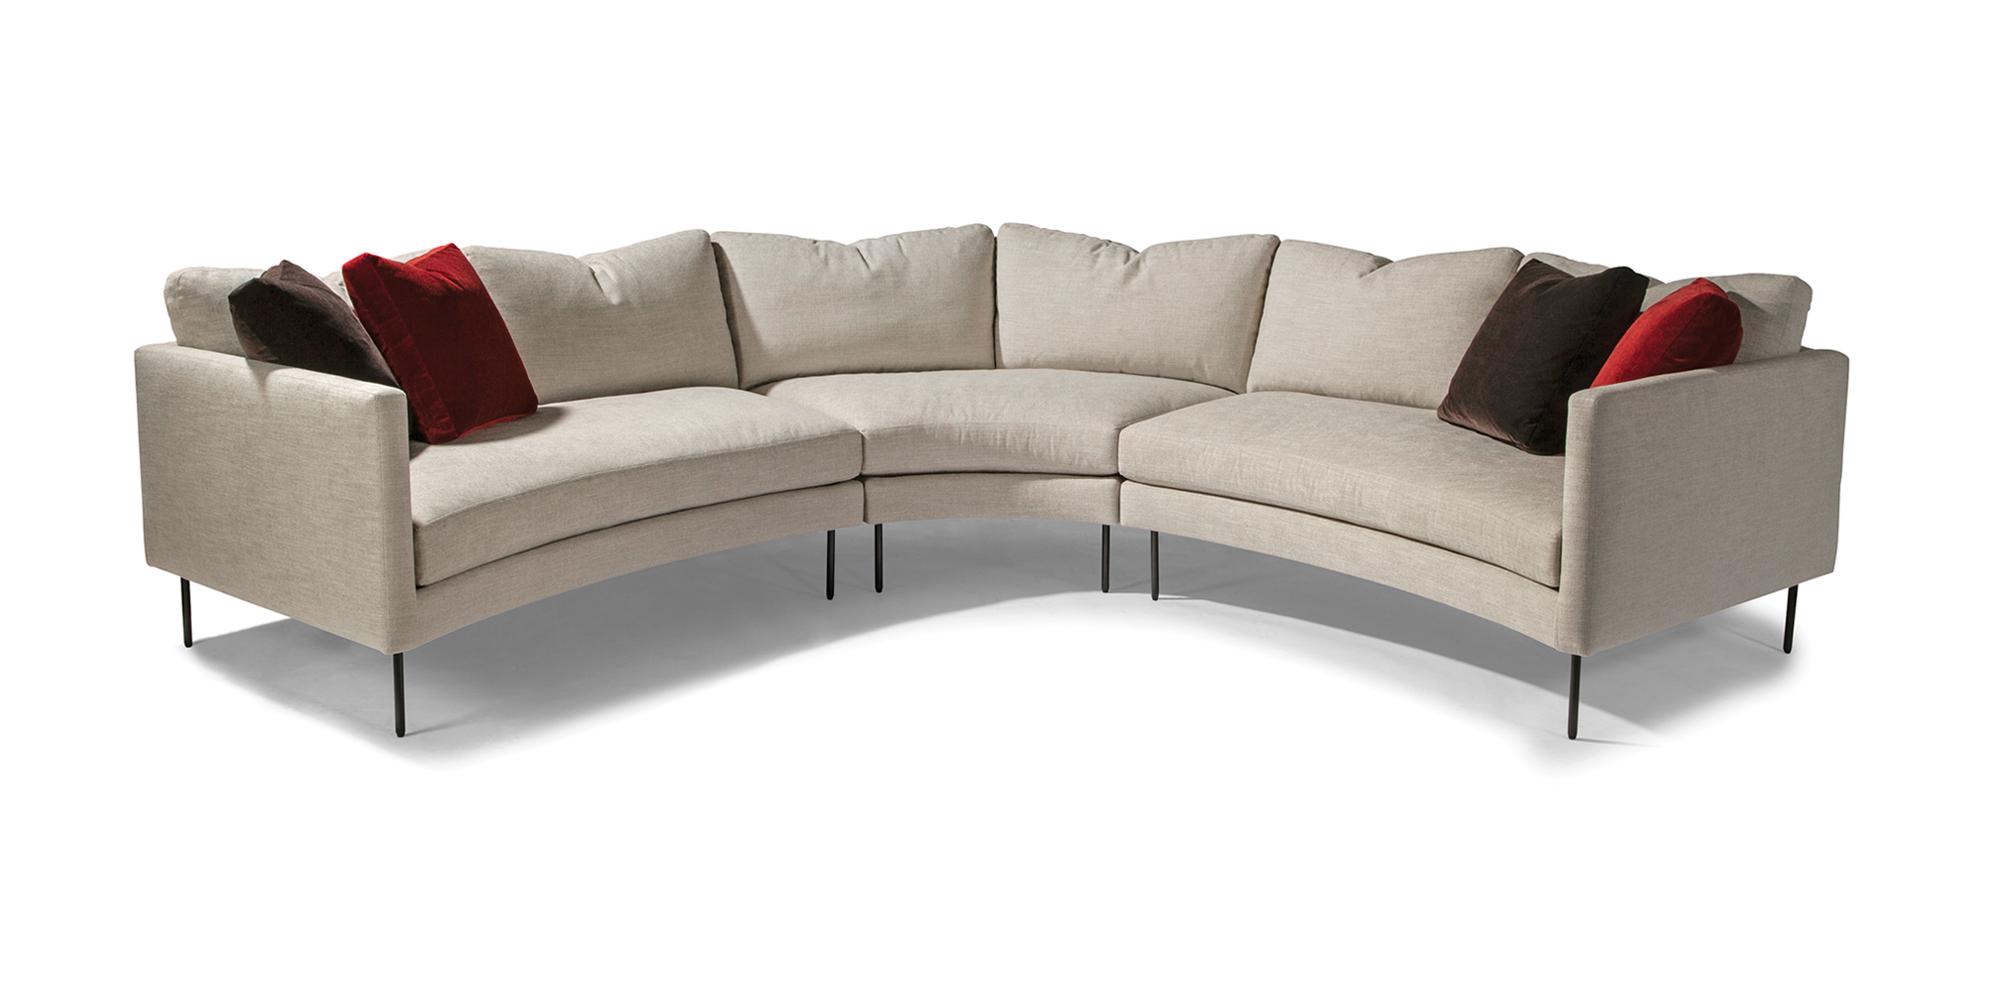 Strange Thayer Coggin Sectional Gallery Cjindustries Chair Design For Home Cjindustriesco